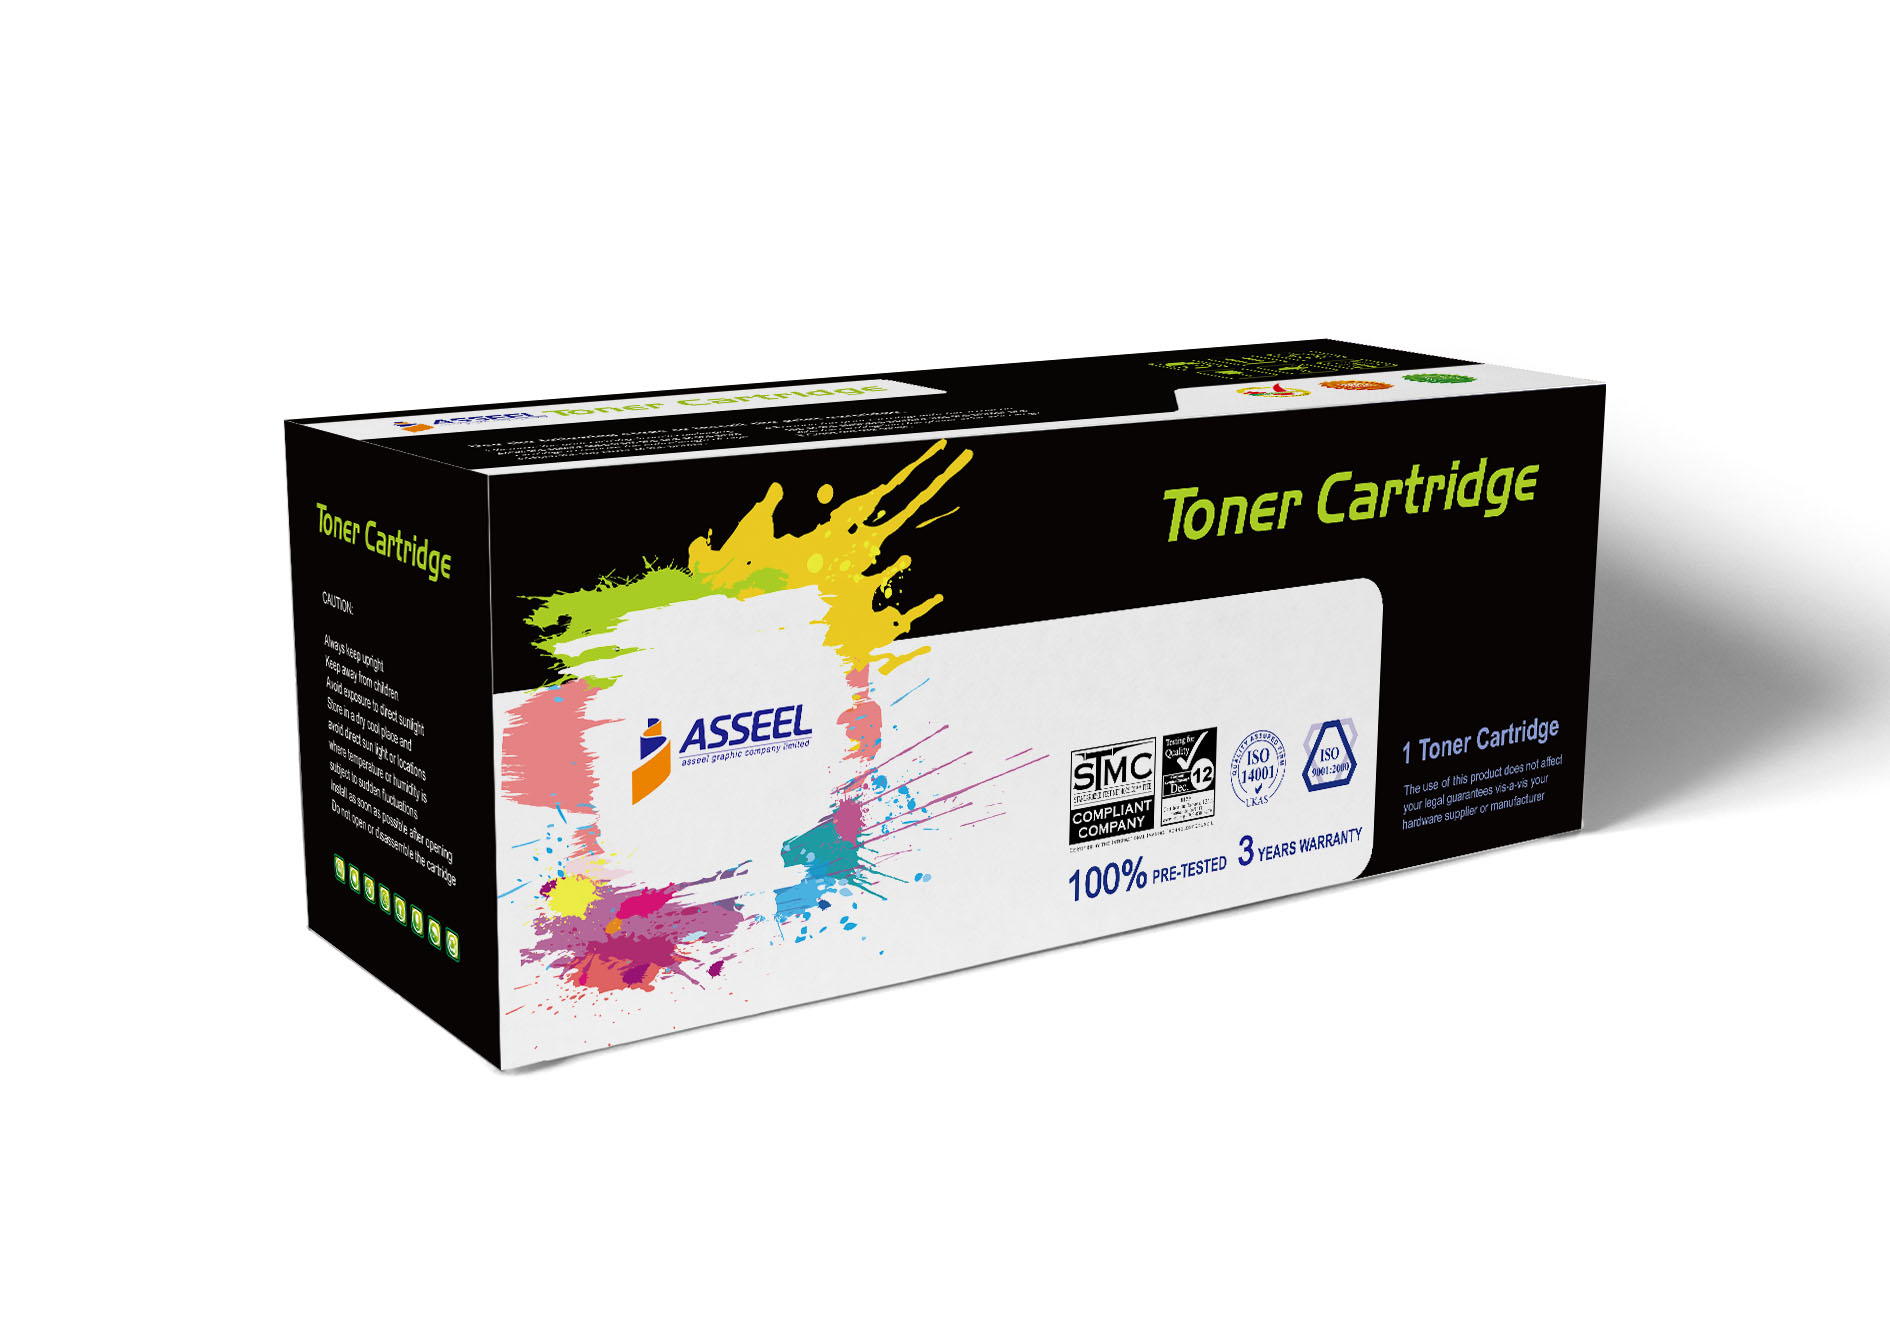 Asseel toner cartridge box (4)